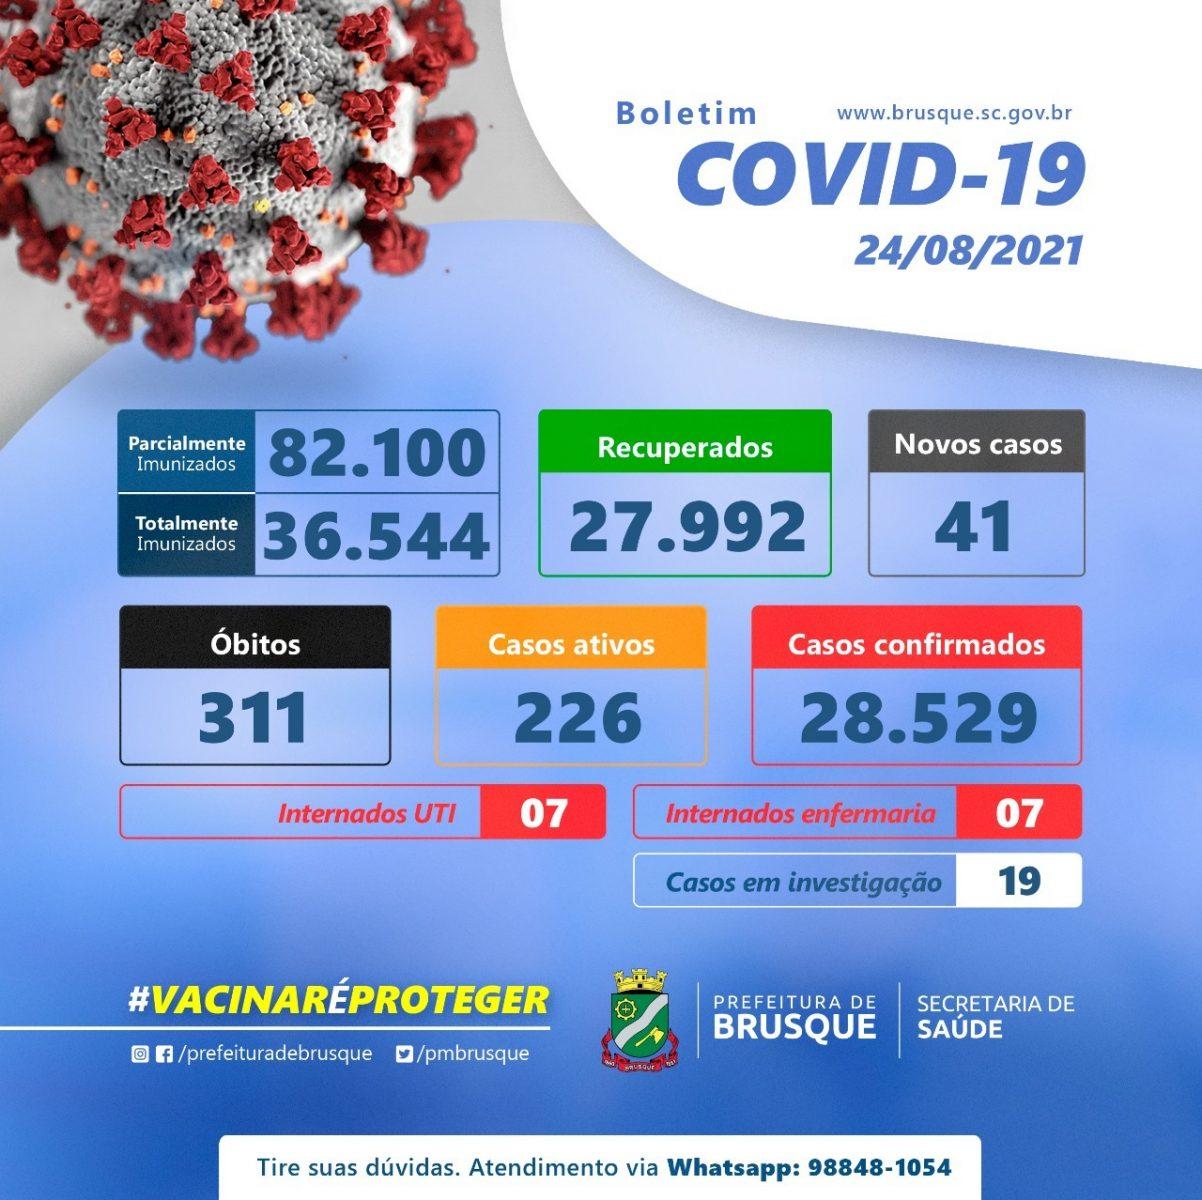 Covid-19: Confira o boletim epidemiológico desta terça-feira (24)